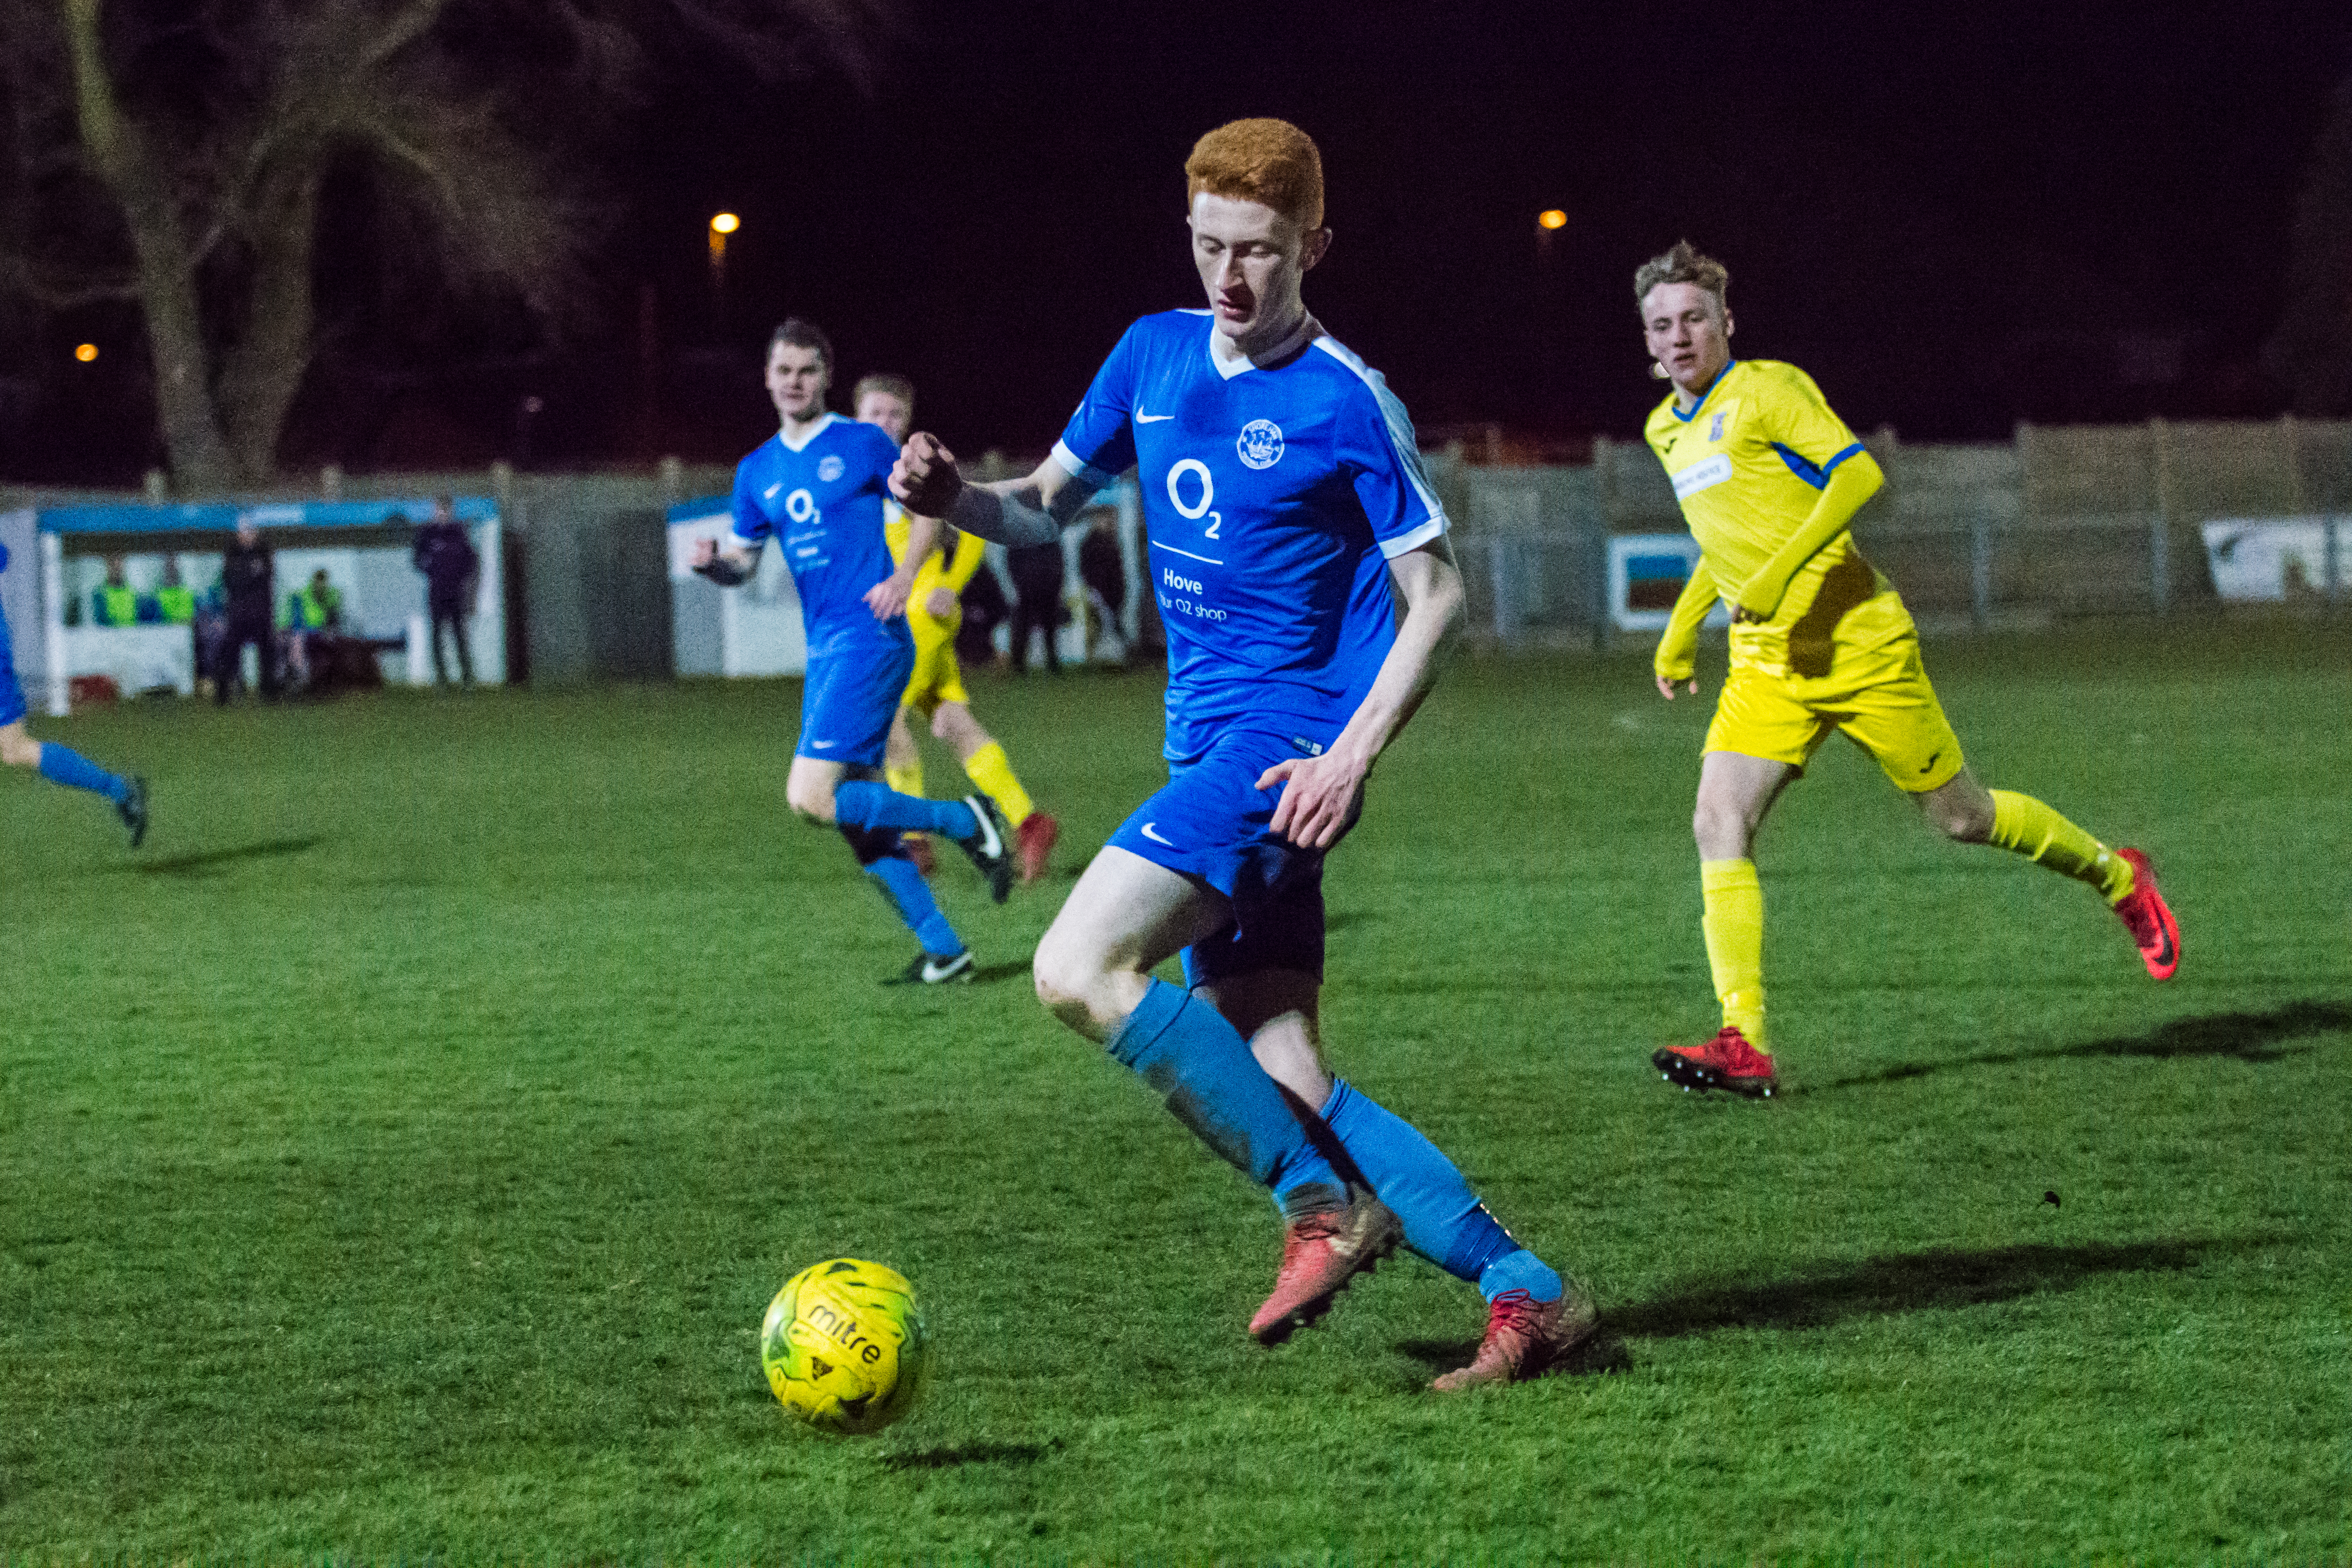 DAVID_JEFFERY Shoreham FC U18s vs Woking FC Academy 22.03.18 54